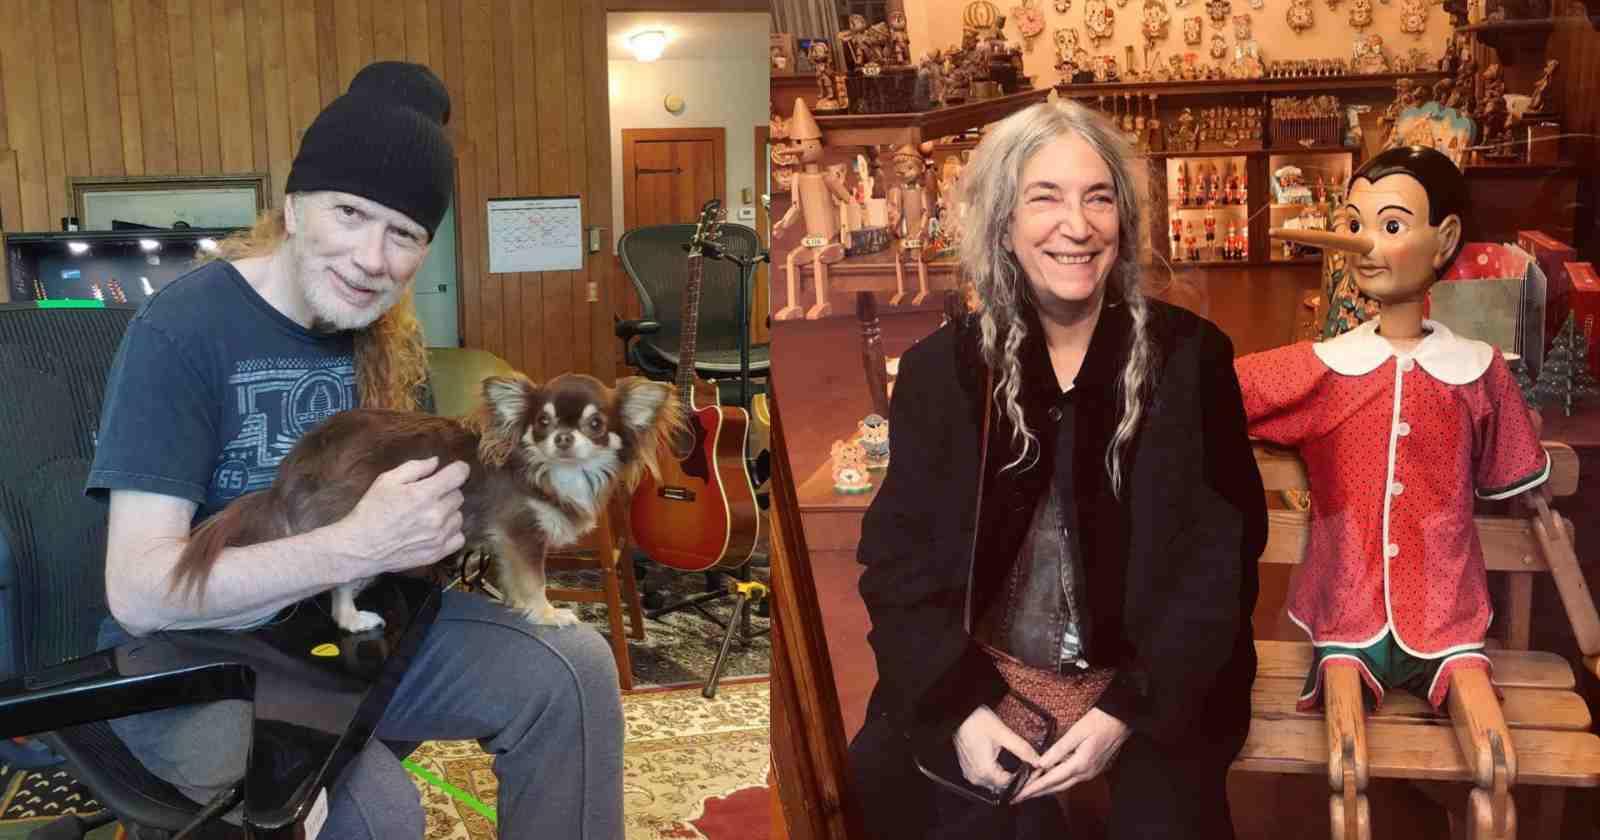 Dave Mustaine Patti Smith